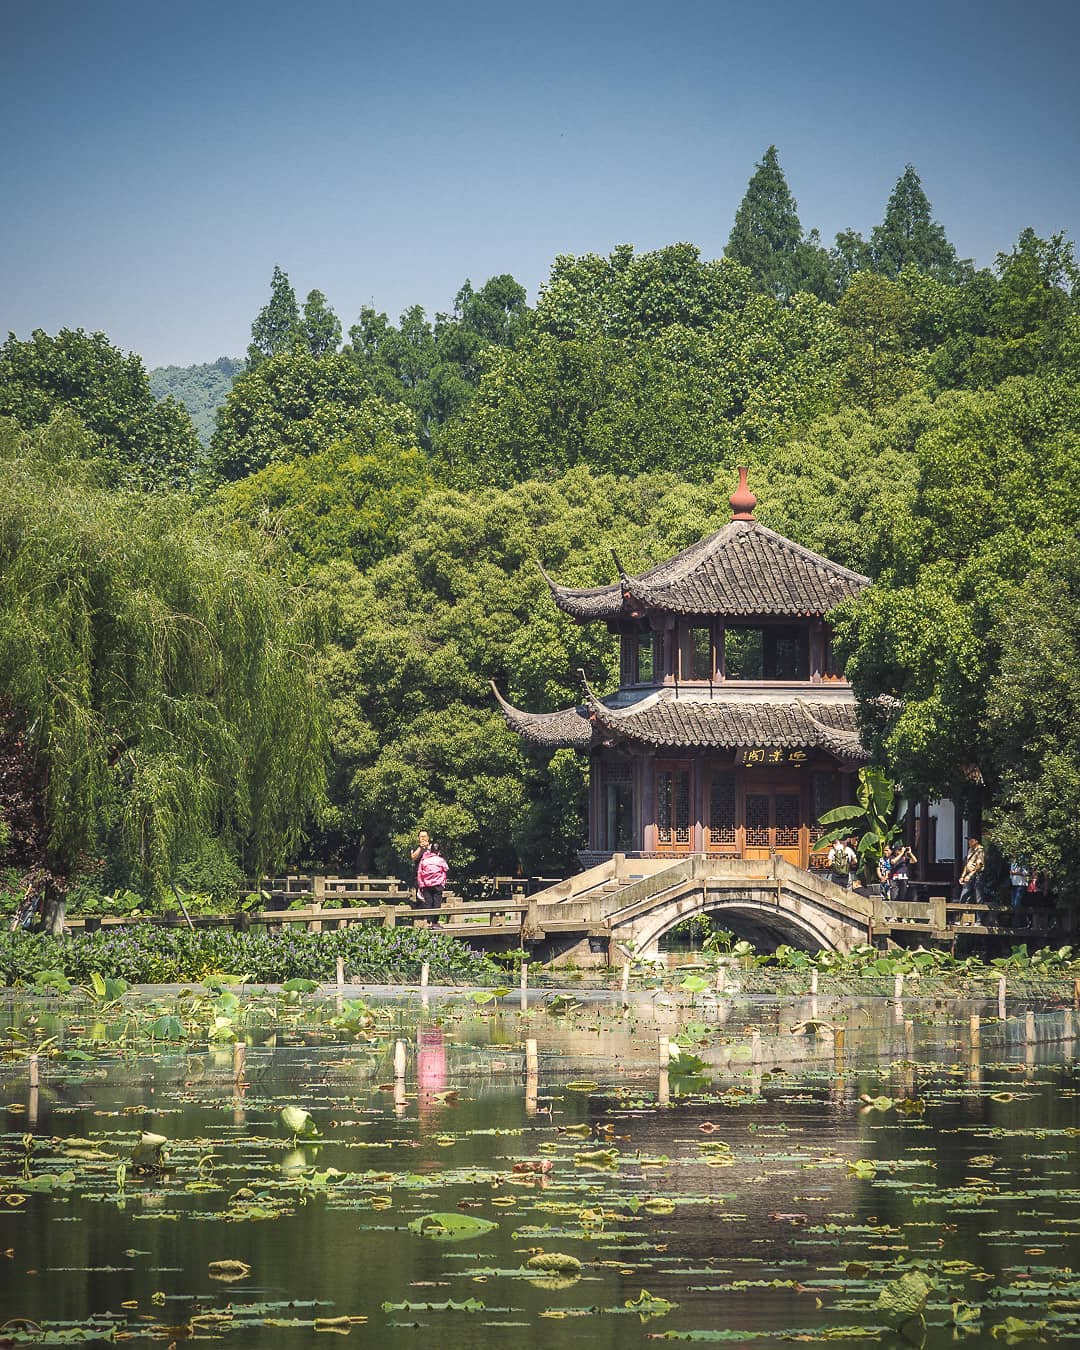 West Lake Area Hangzhou, China